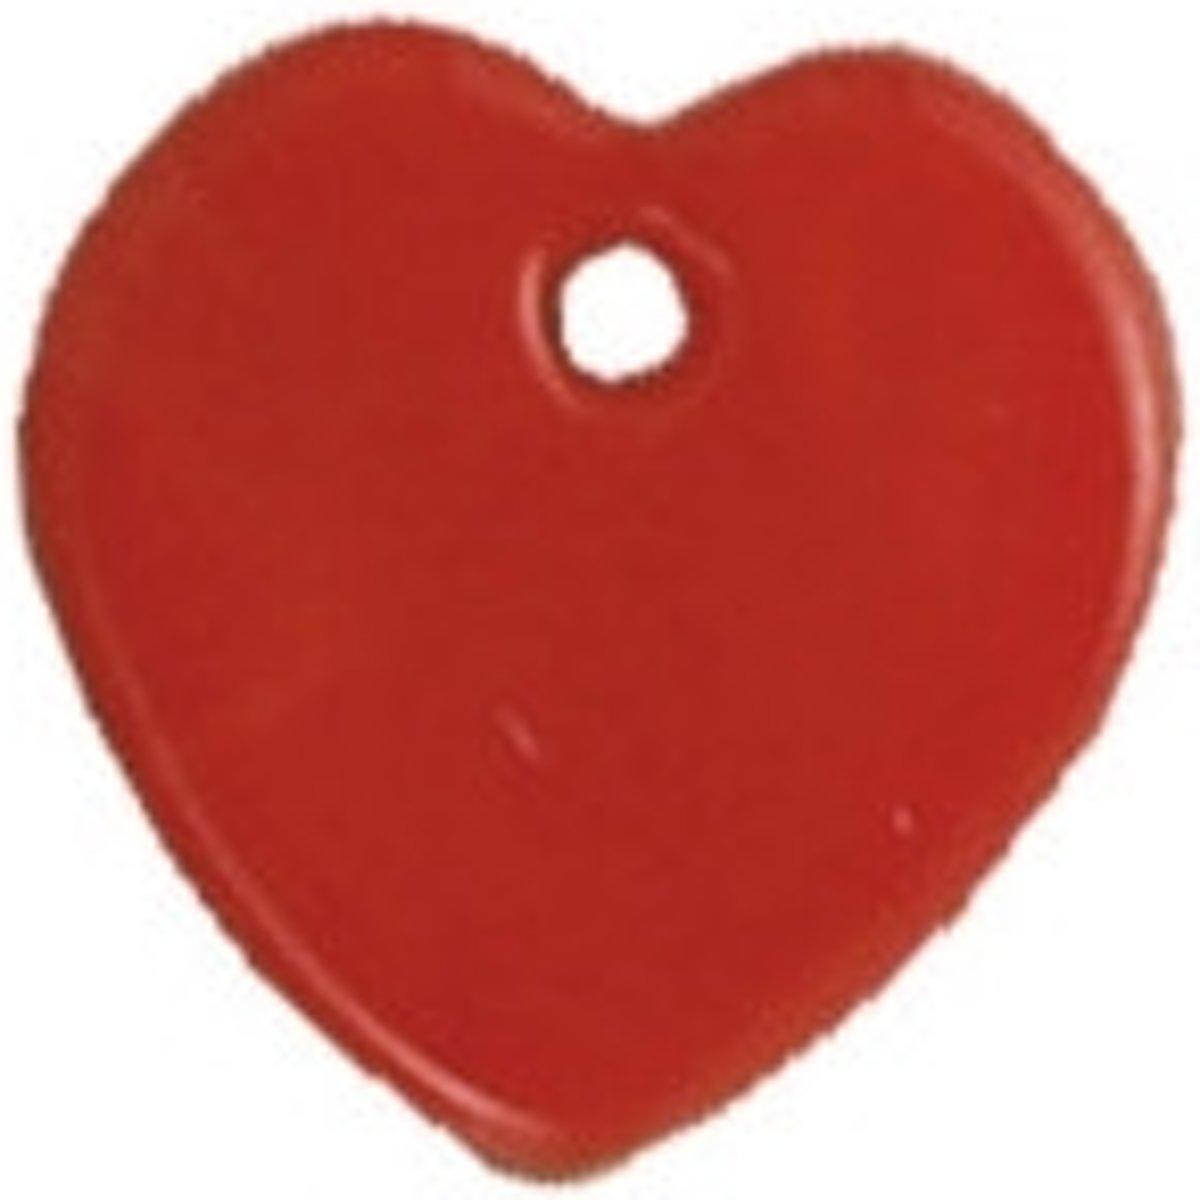 Afbeelding van product Buttons ass. 1 pk. a 6 st. red heart river shell dangles